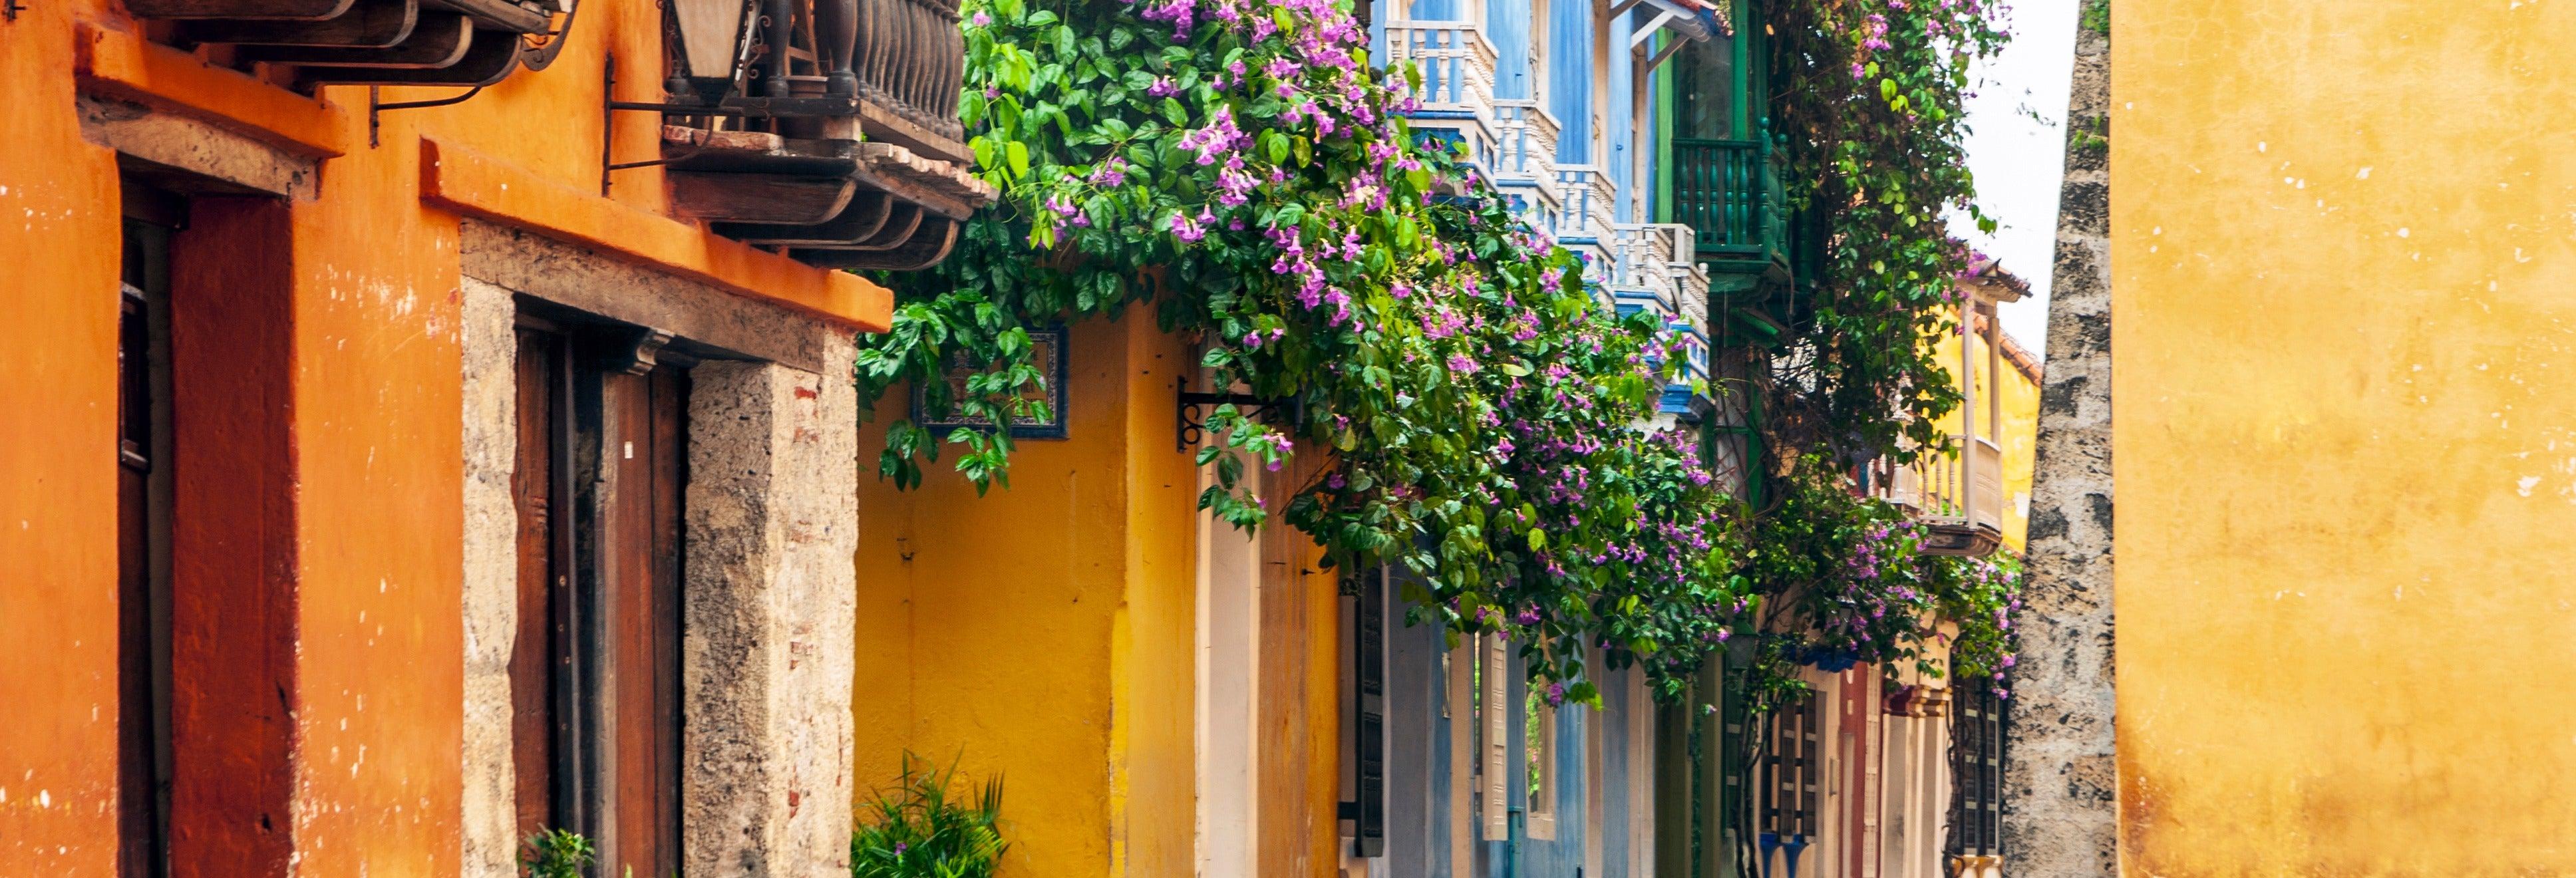 Excursión a Cartagena de Indias